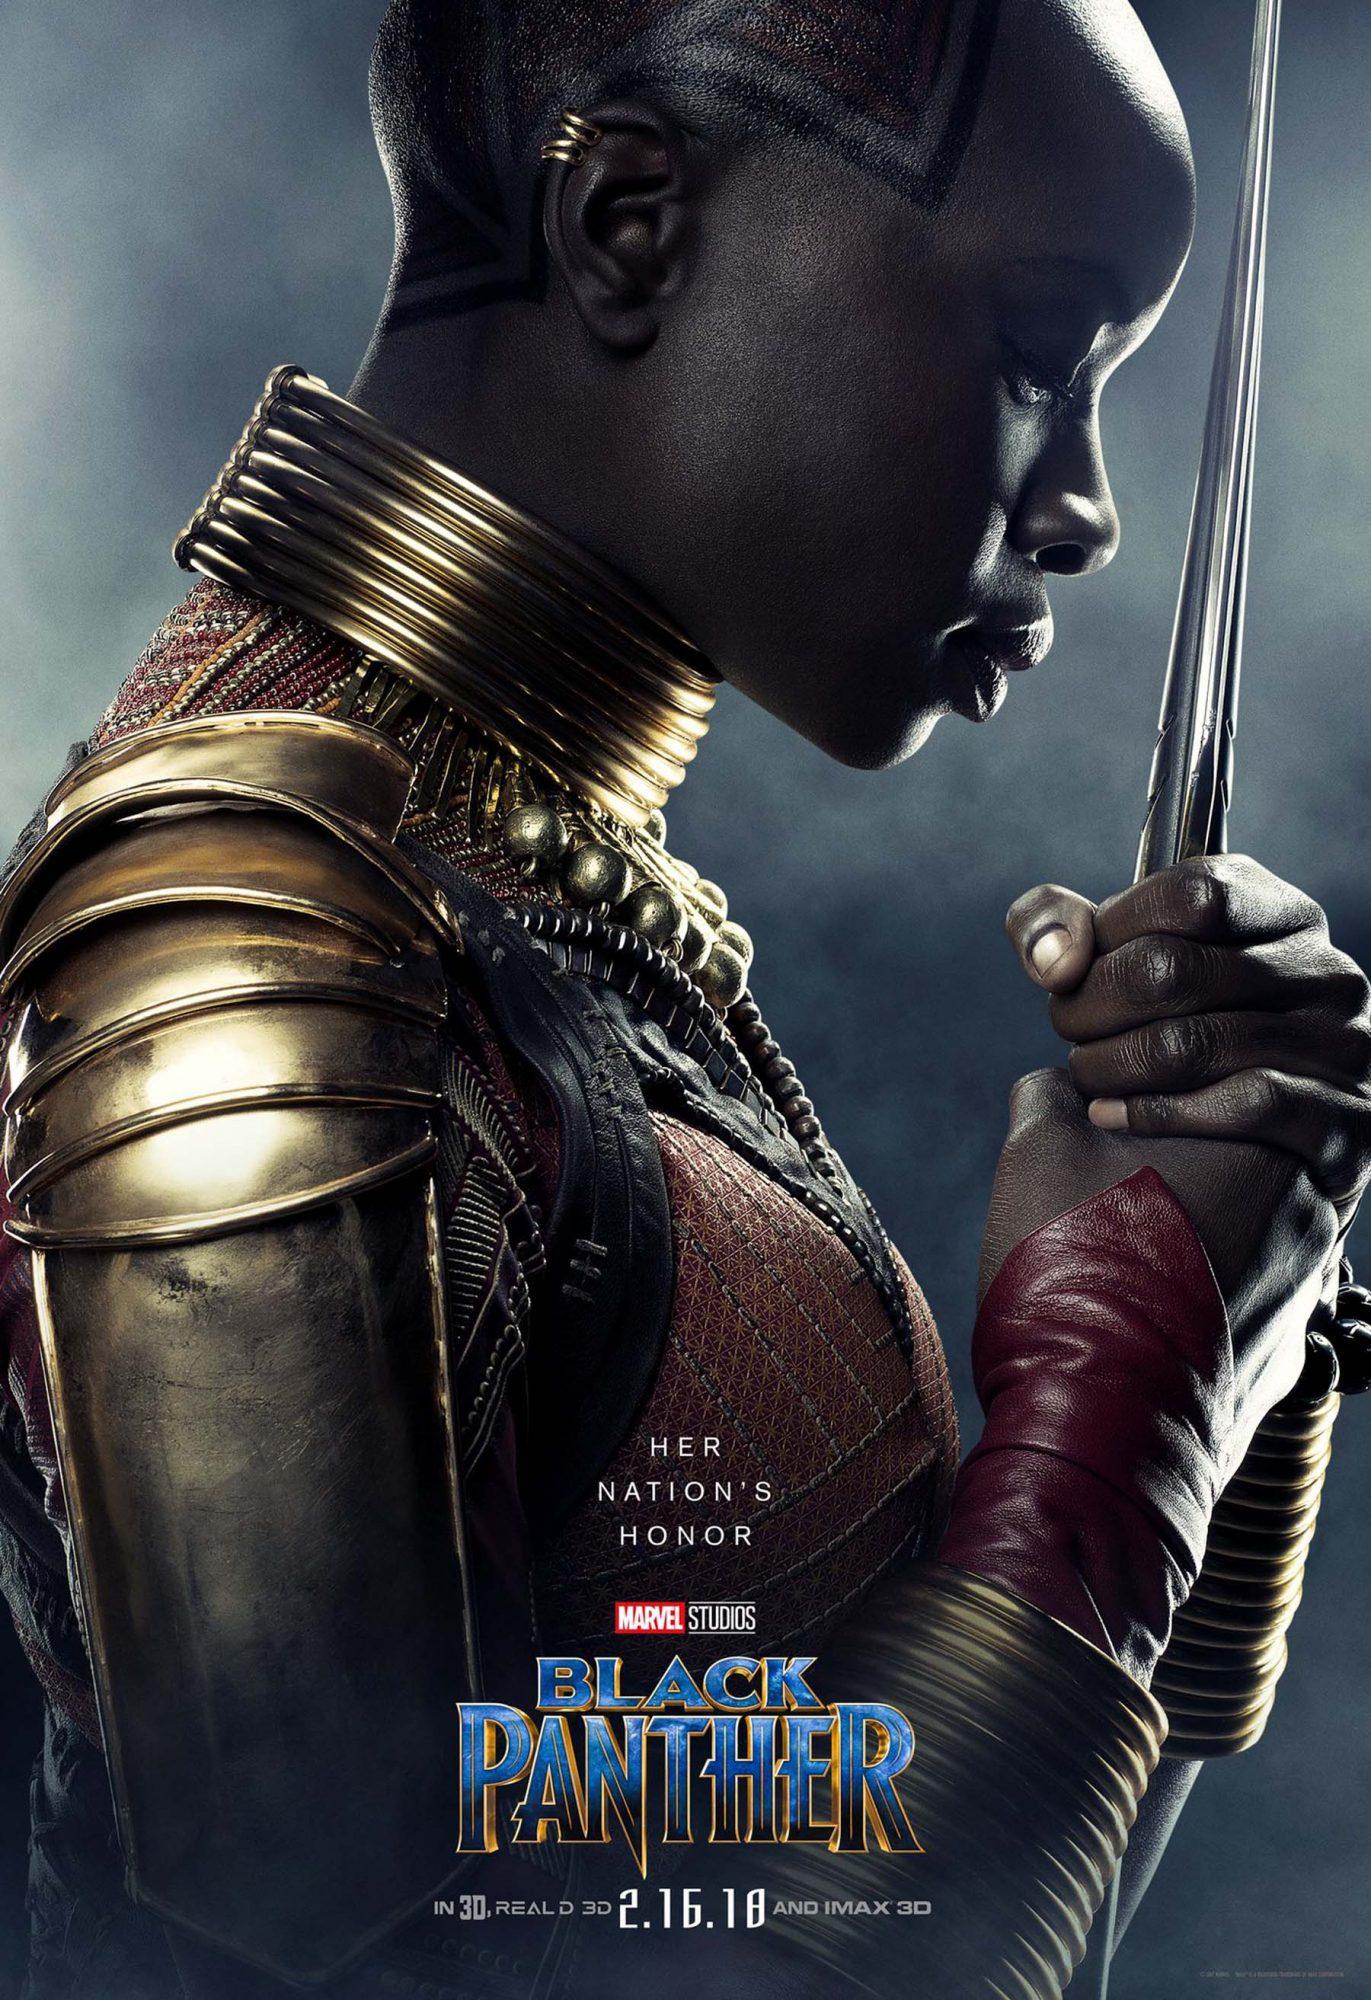 Black Panther character posterCR: Marvel Studios